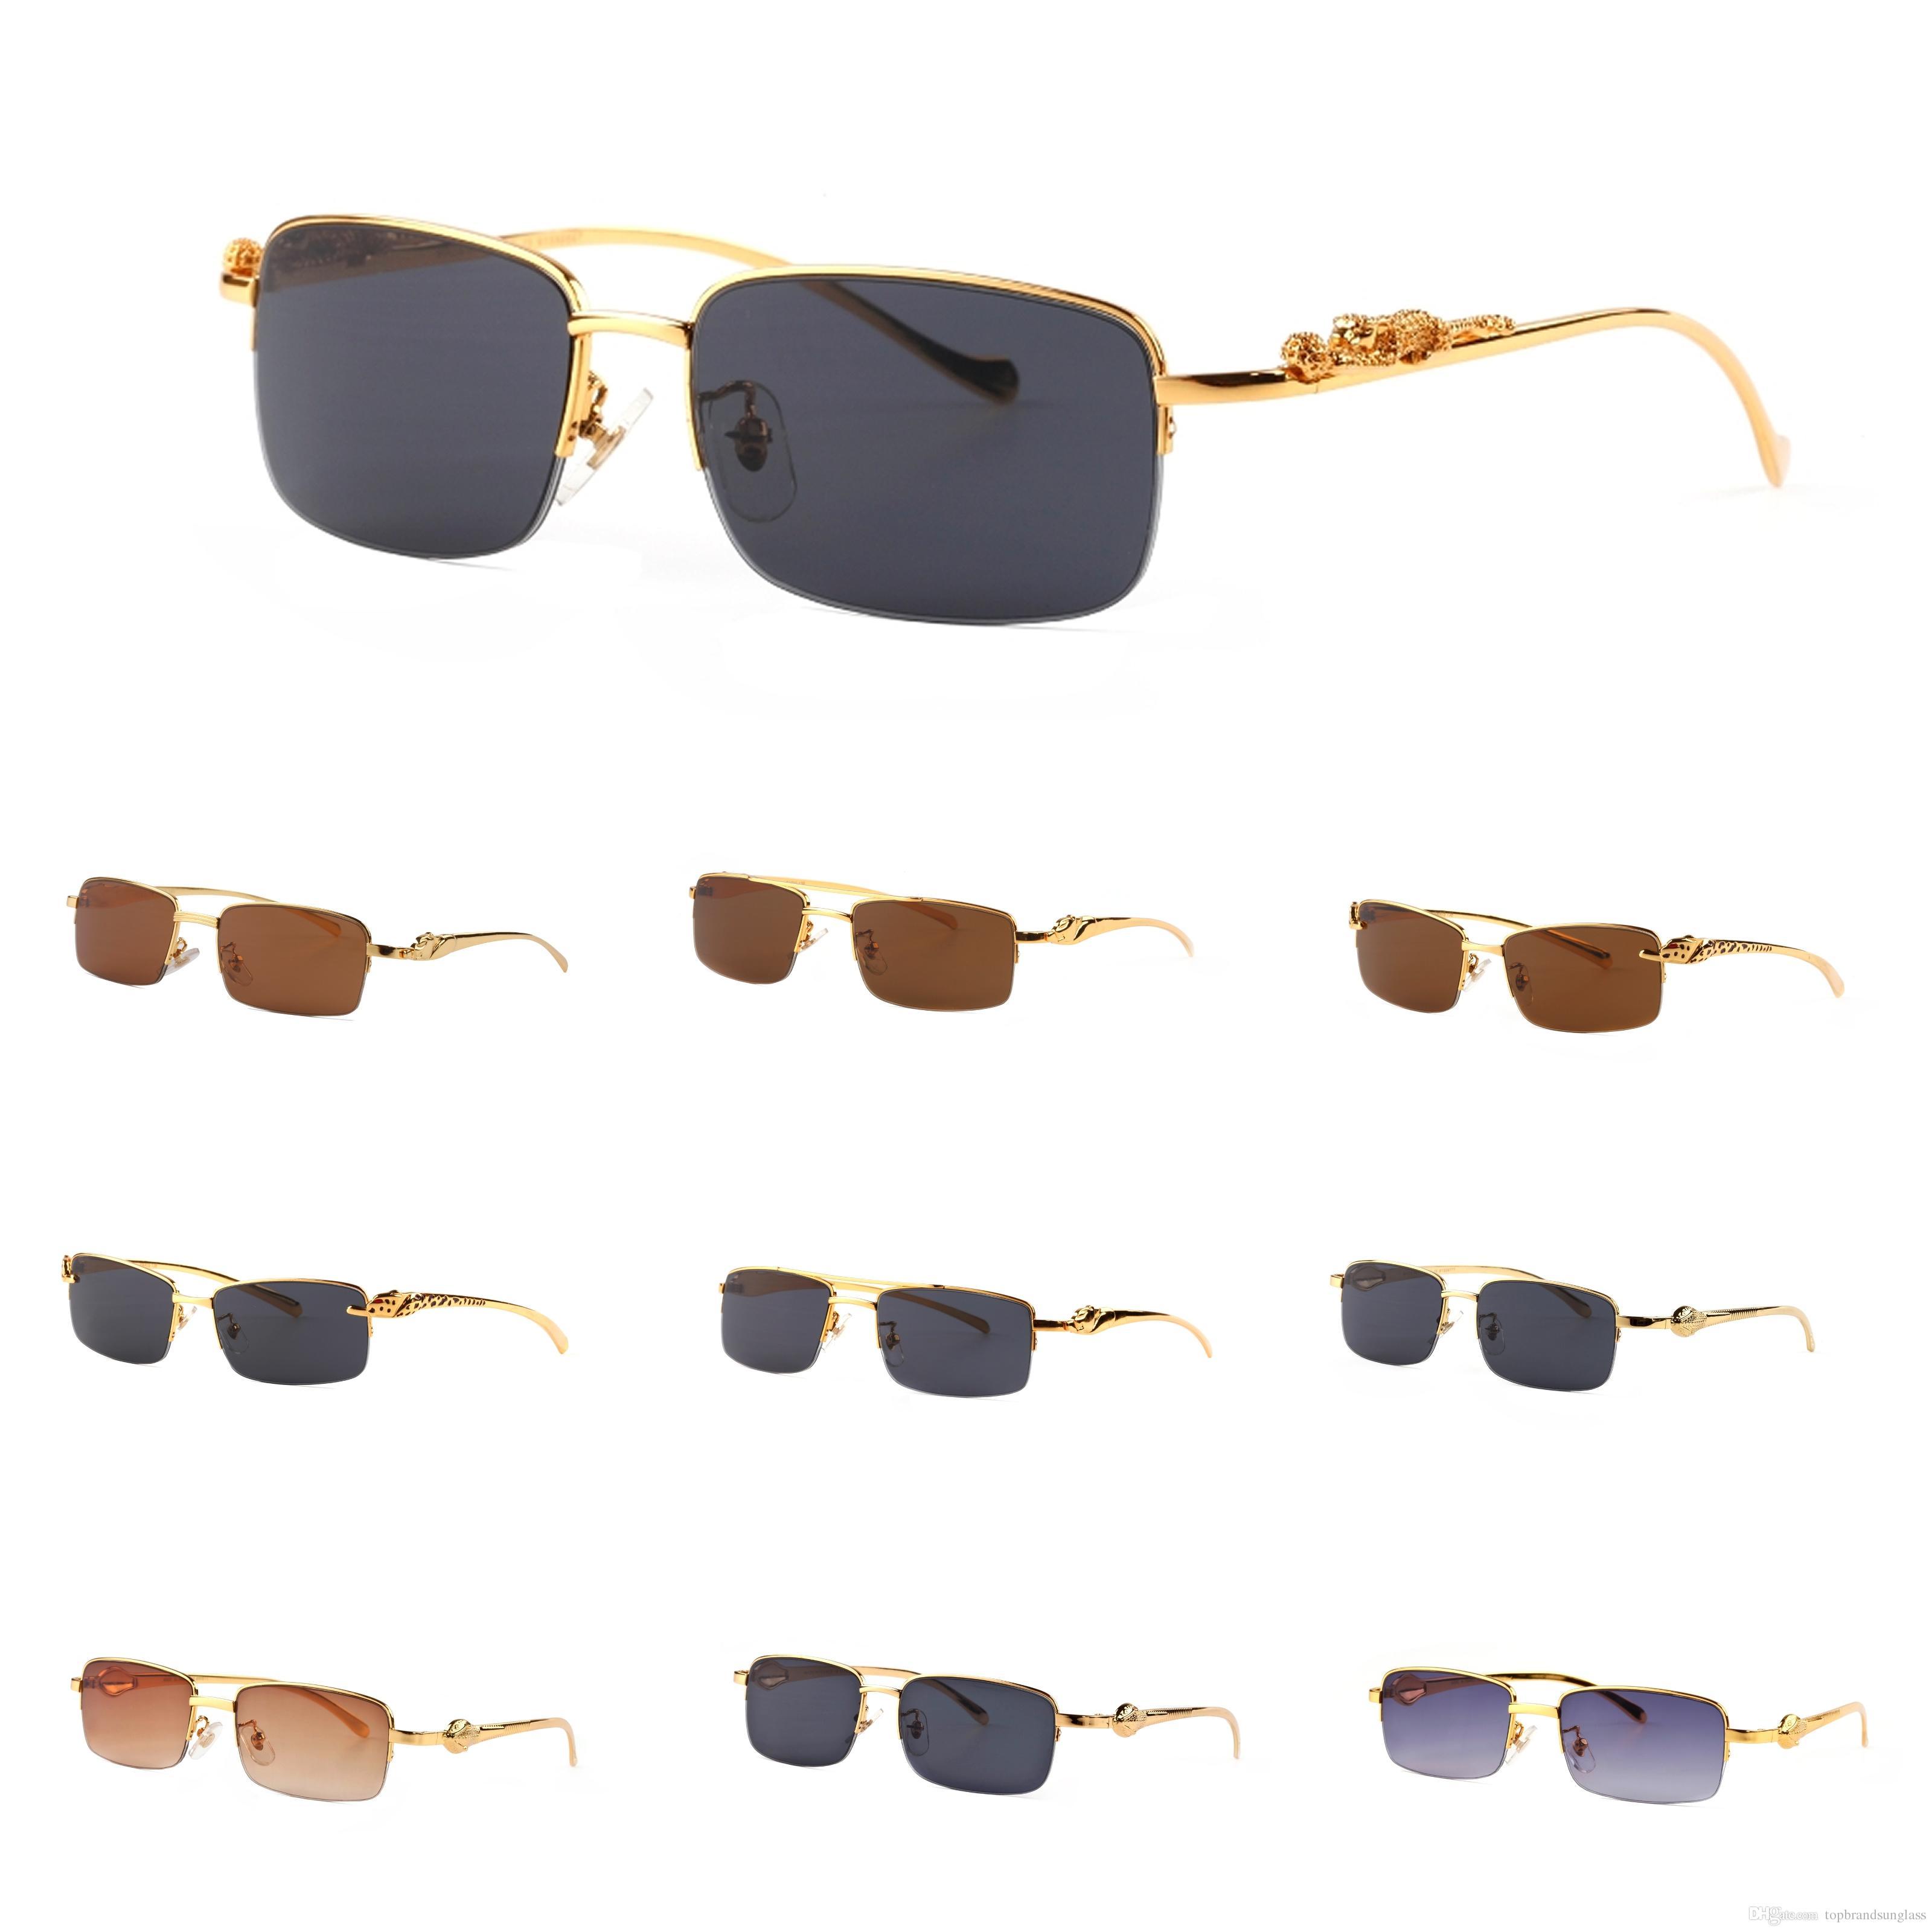 Anti Hot Glasses Divine Wholesale Half Uv400 With New Design Brand Metal Box Grade Sunglasses France Sun Panthere Gold Uv Frame Fashion 2018 TcF13JlK